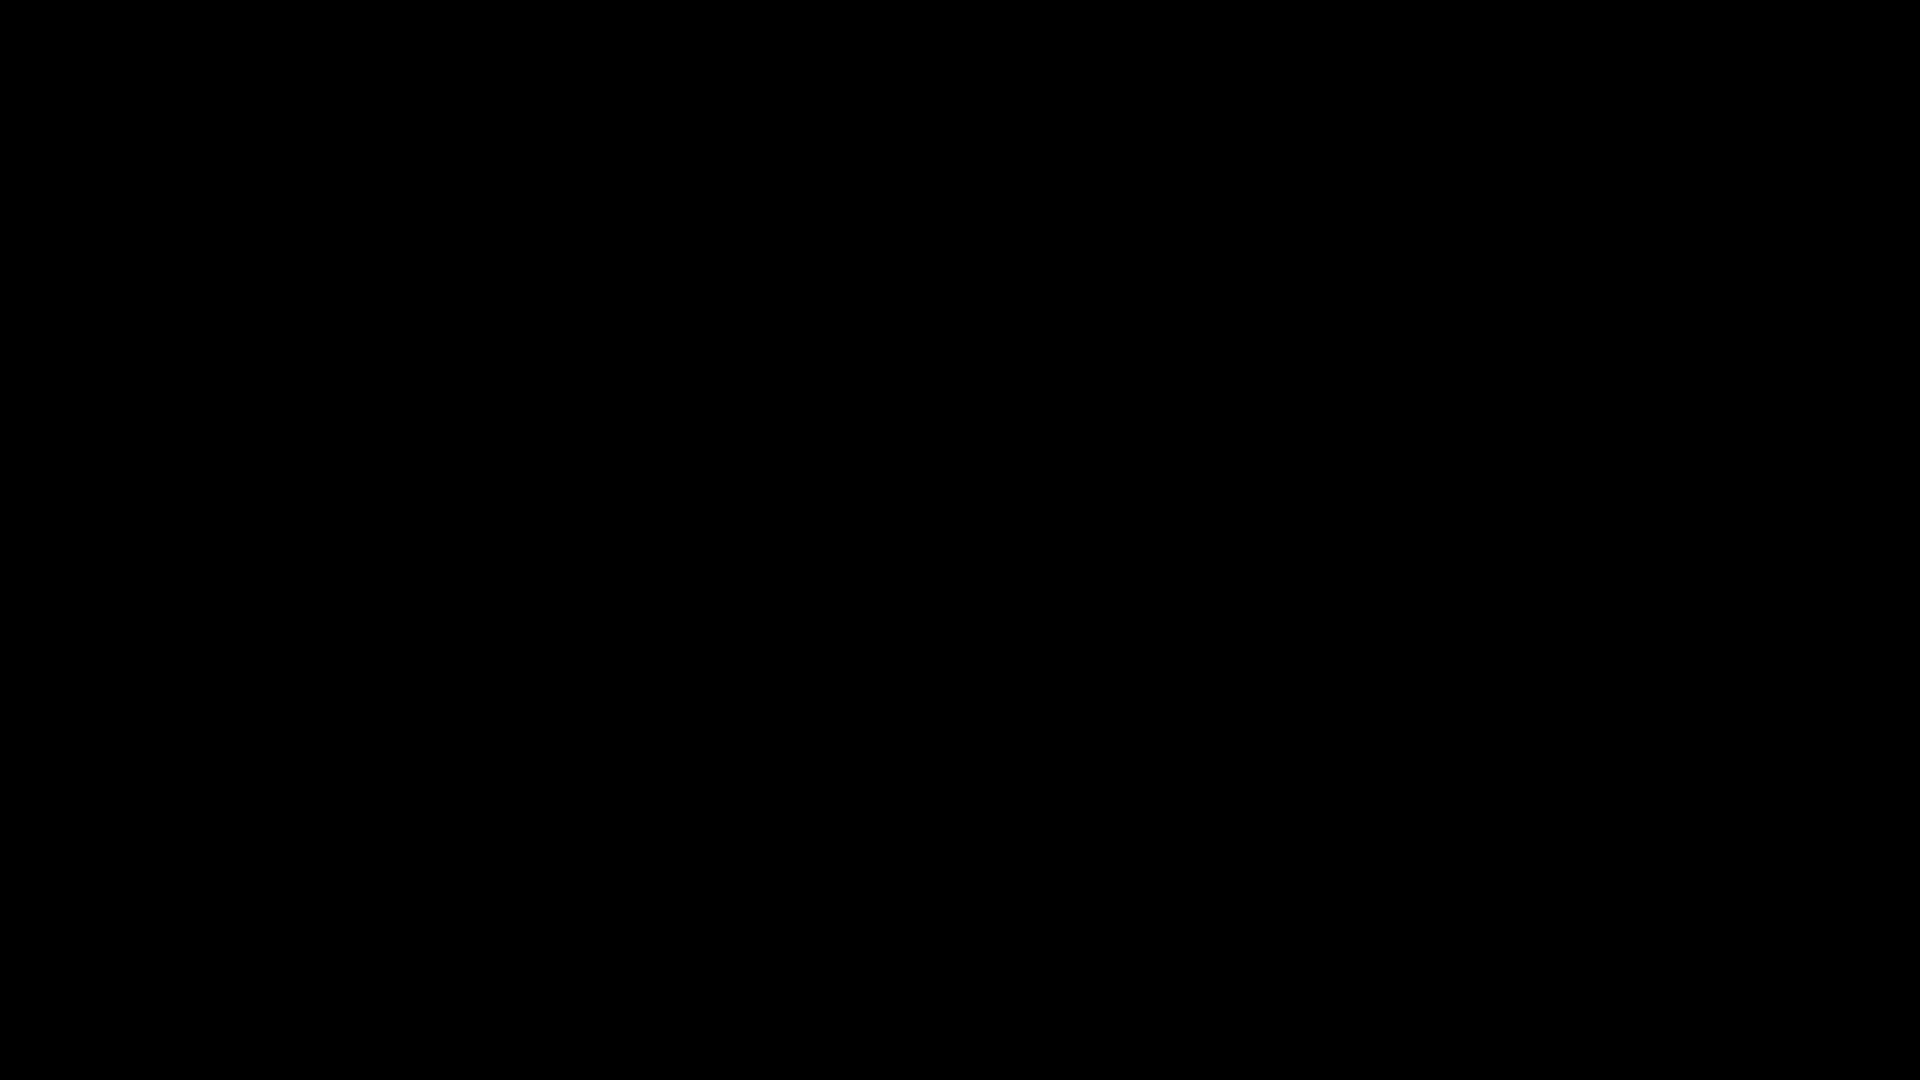 Eddie Brock, Marvel, Marvel Comics, Planet of the Symbiotes, Ruben Fleischer, Spider-man, Tom Hardy, Venom, Venom (2018), Venom Movie, eddie brock, marvel, marvel comics, planet of the symbiotes, ruben fleischer, spider-man, tom hardy, venom, venom (2018), venom movie, VENOM - Official Trailer 2 (HD) GIFs